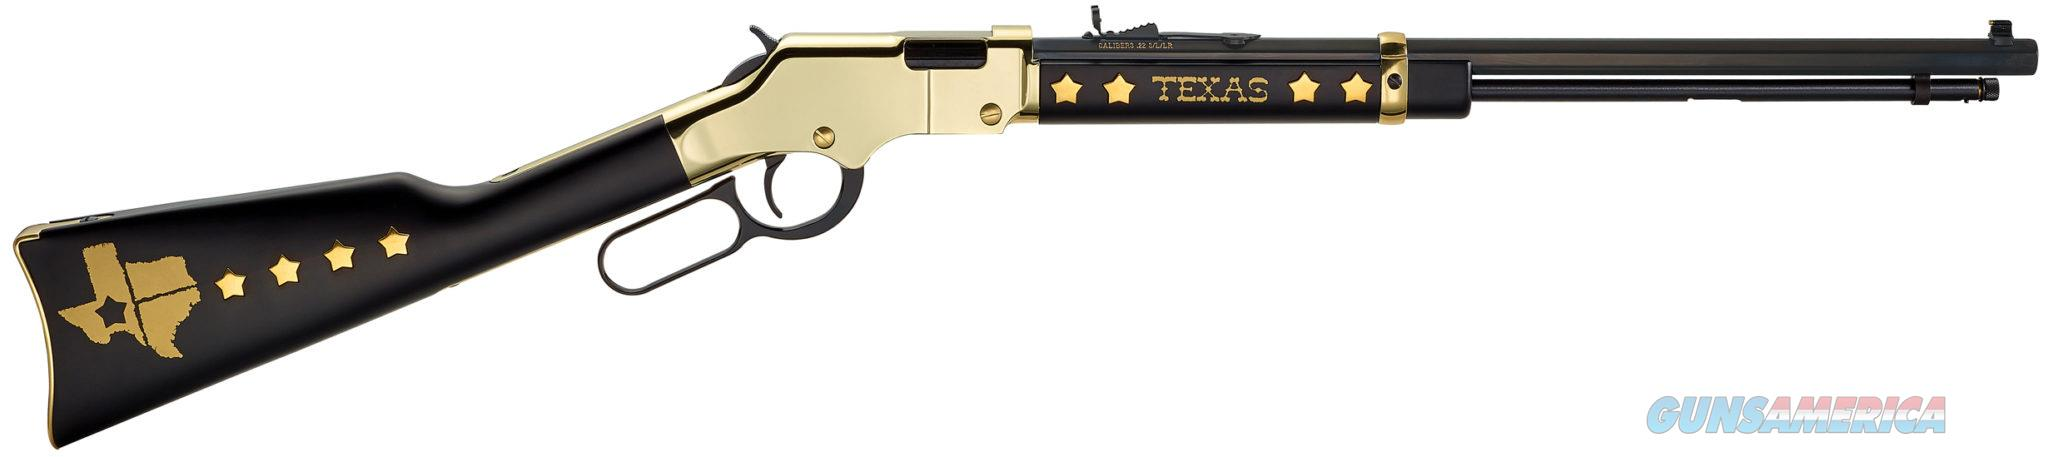 "Henry Texas Tribute Edition .22 LR 21"" Octagon Blued H004TX  Guns > Rifles > Henry Rifle Company"